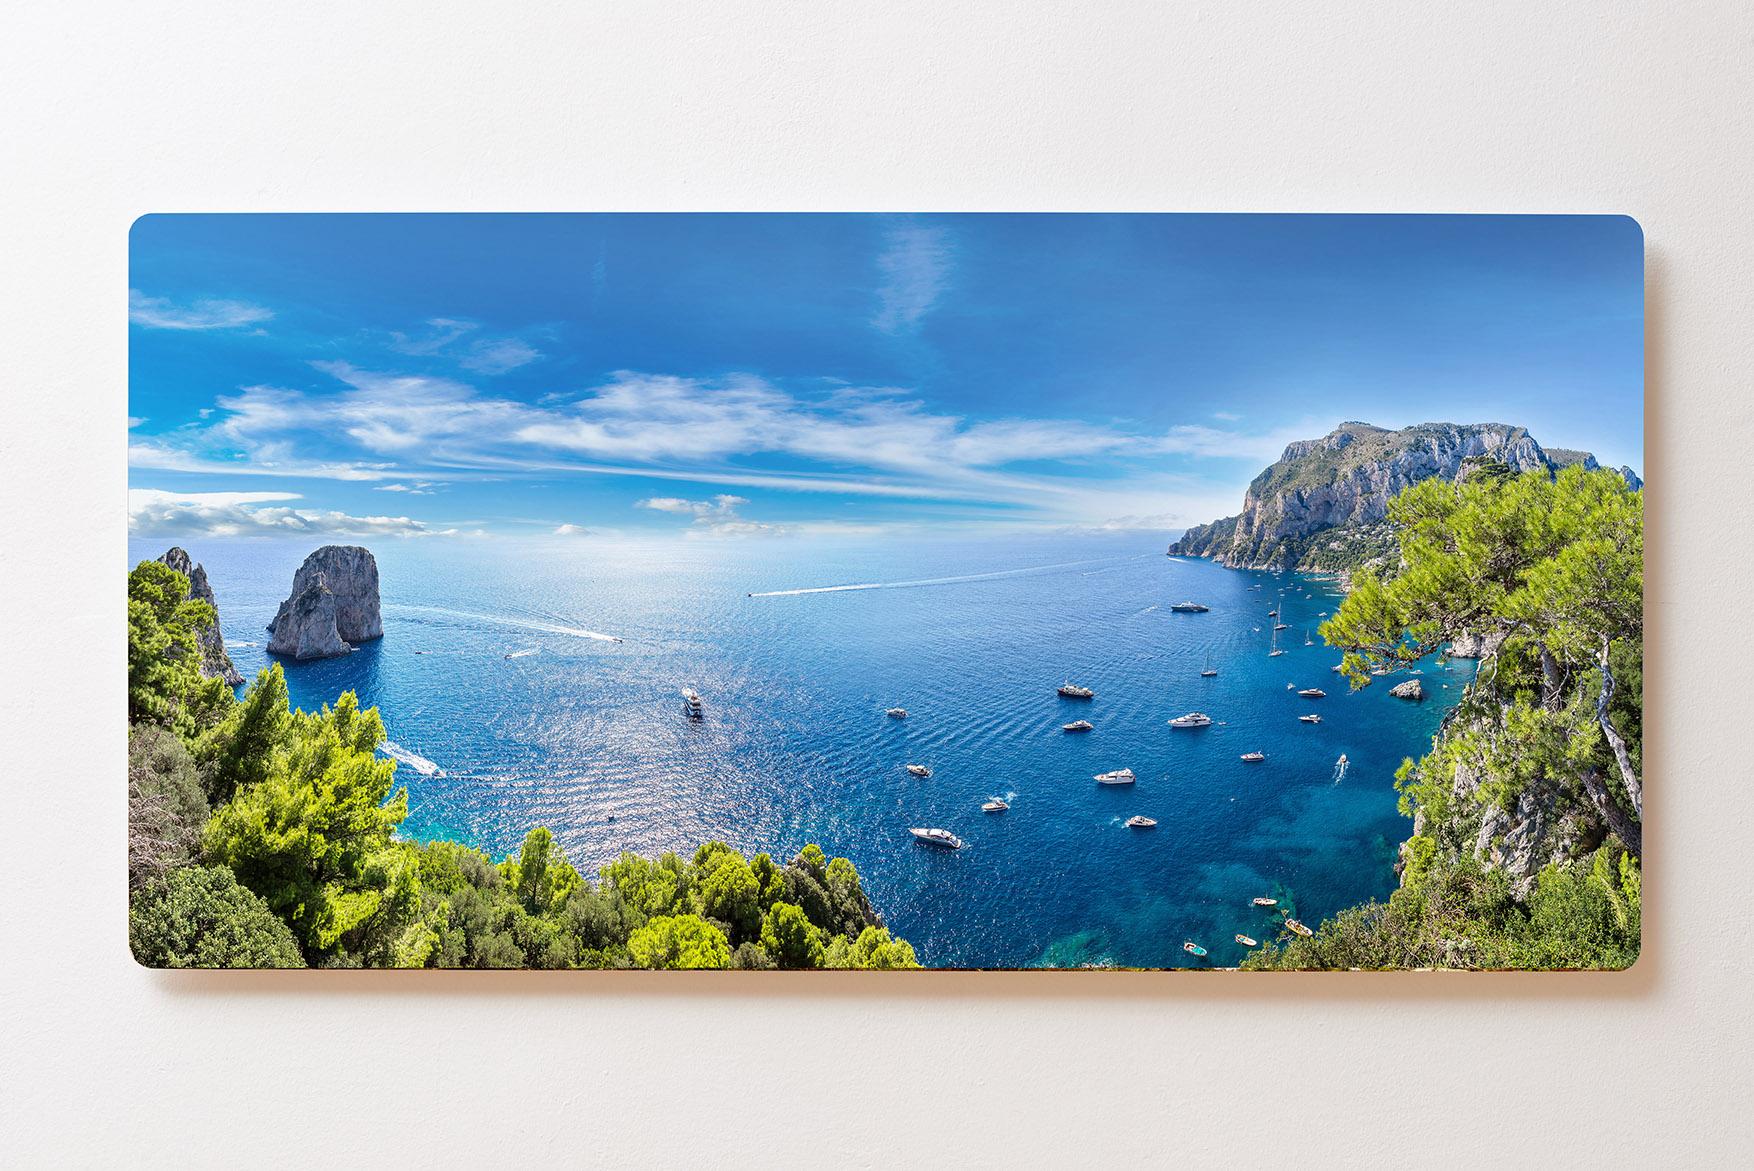 Magnettafel BACKLIGHT 120x60cm Motiv-Wandbild M140 Meer Küste